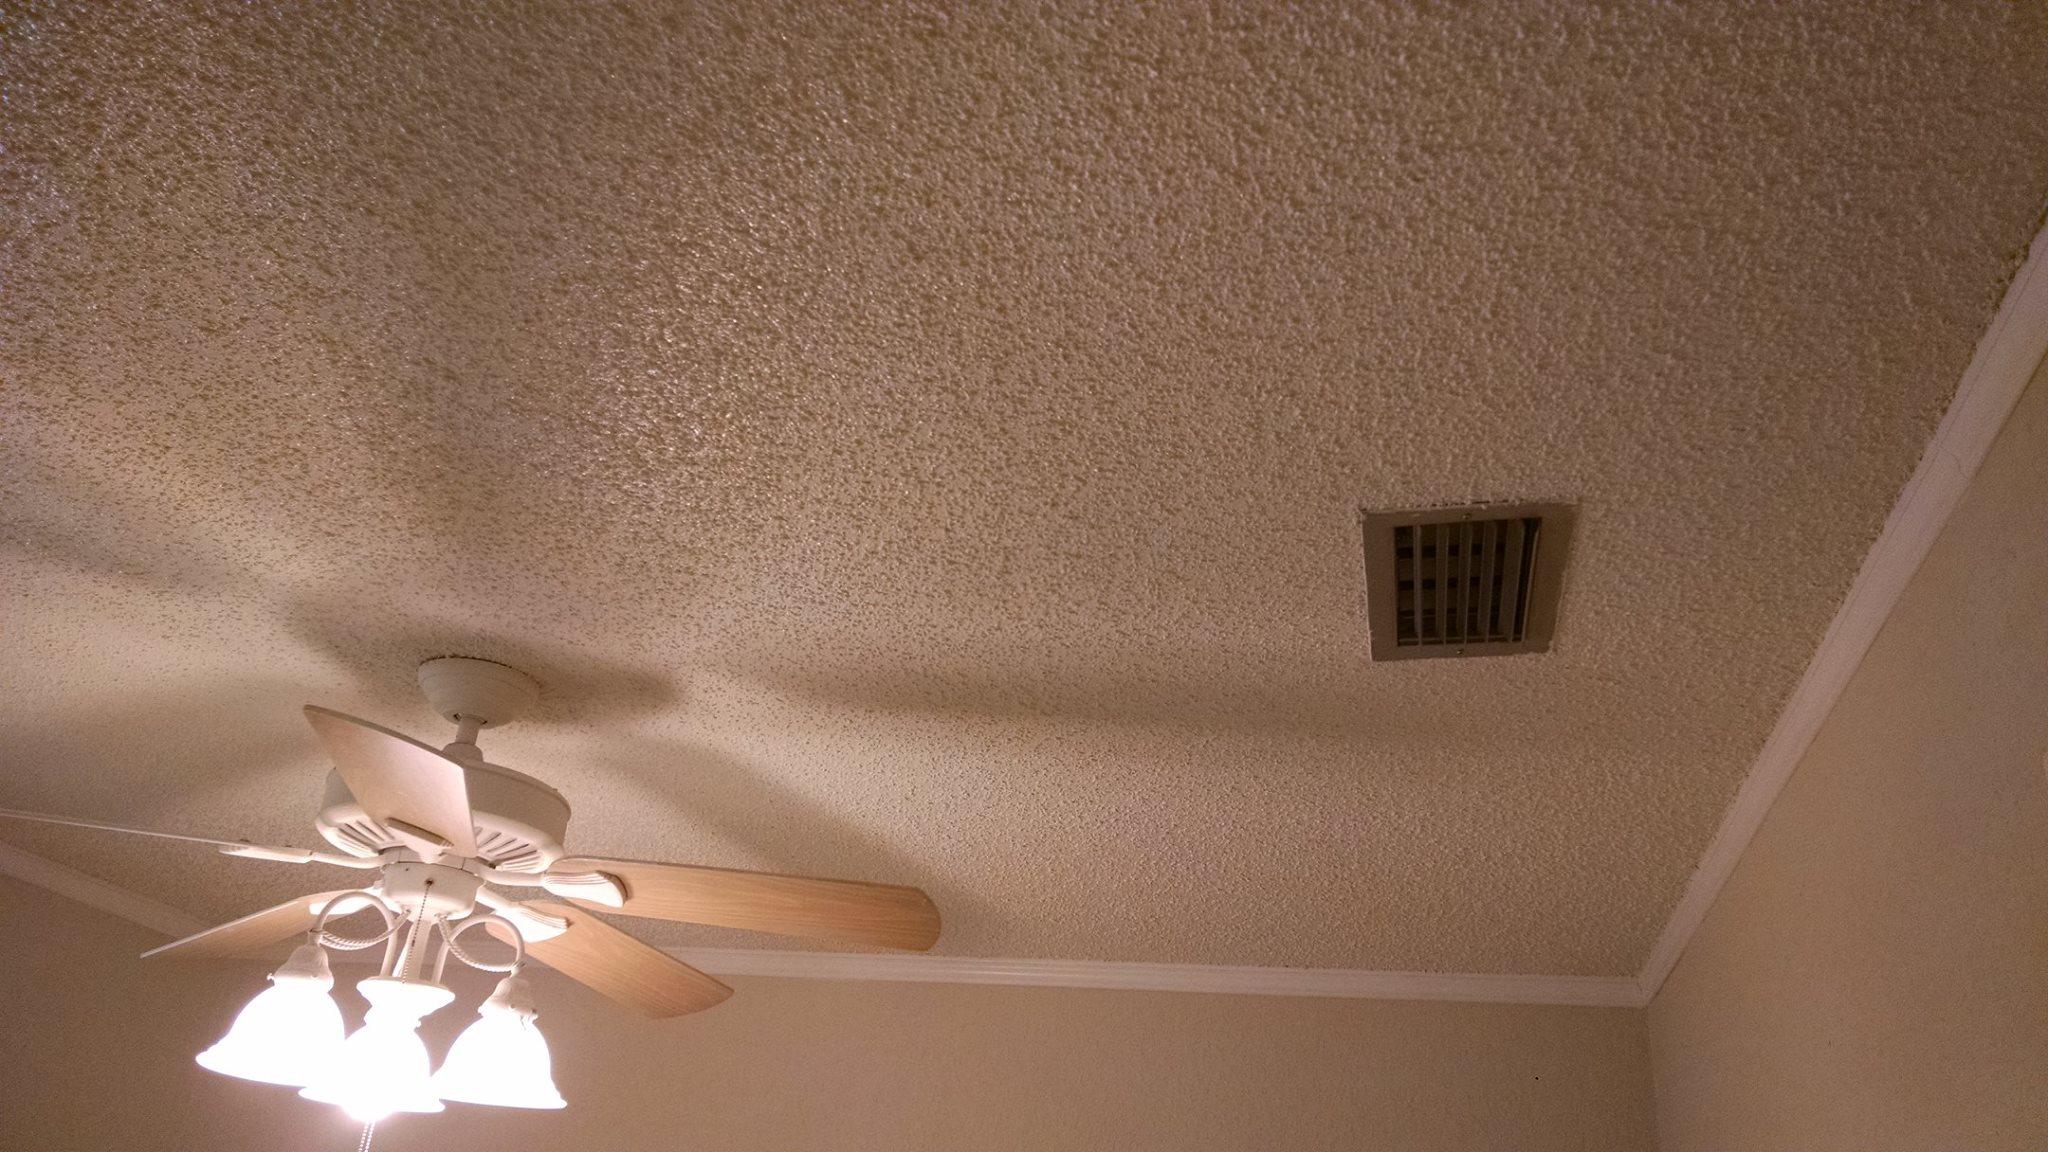 Popcorn Ceiling Repair After   Pro Ceilings And Drywall Texture Repair, Inc.